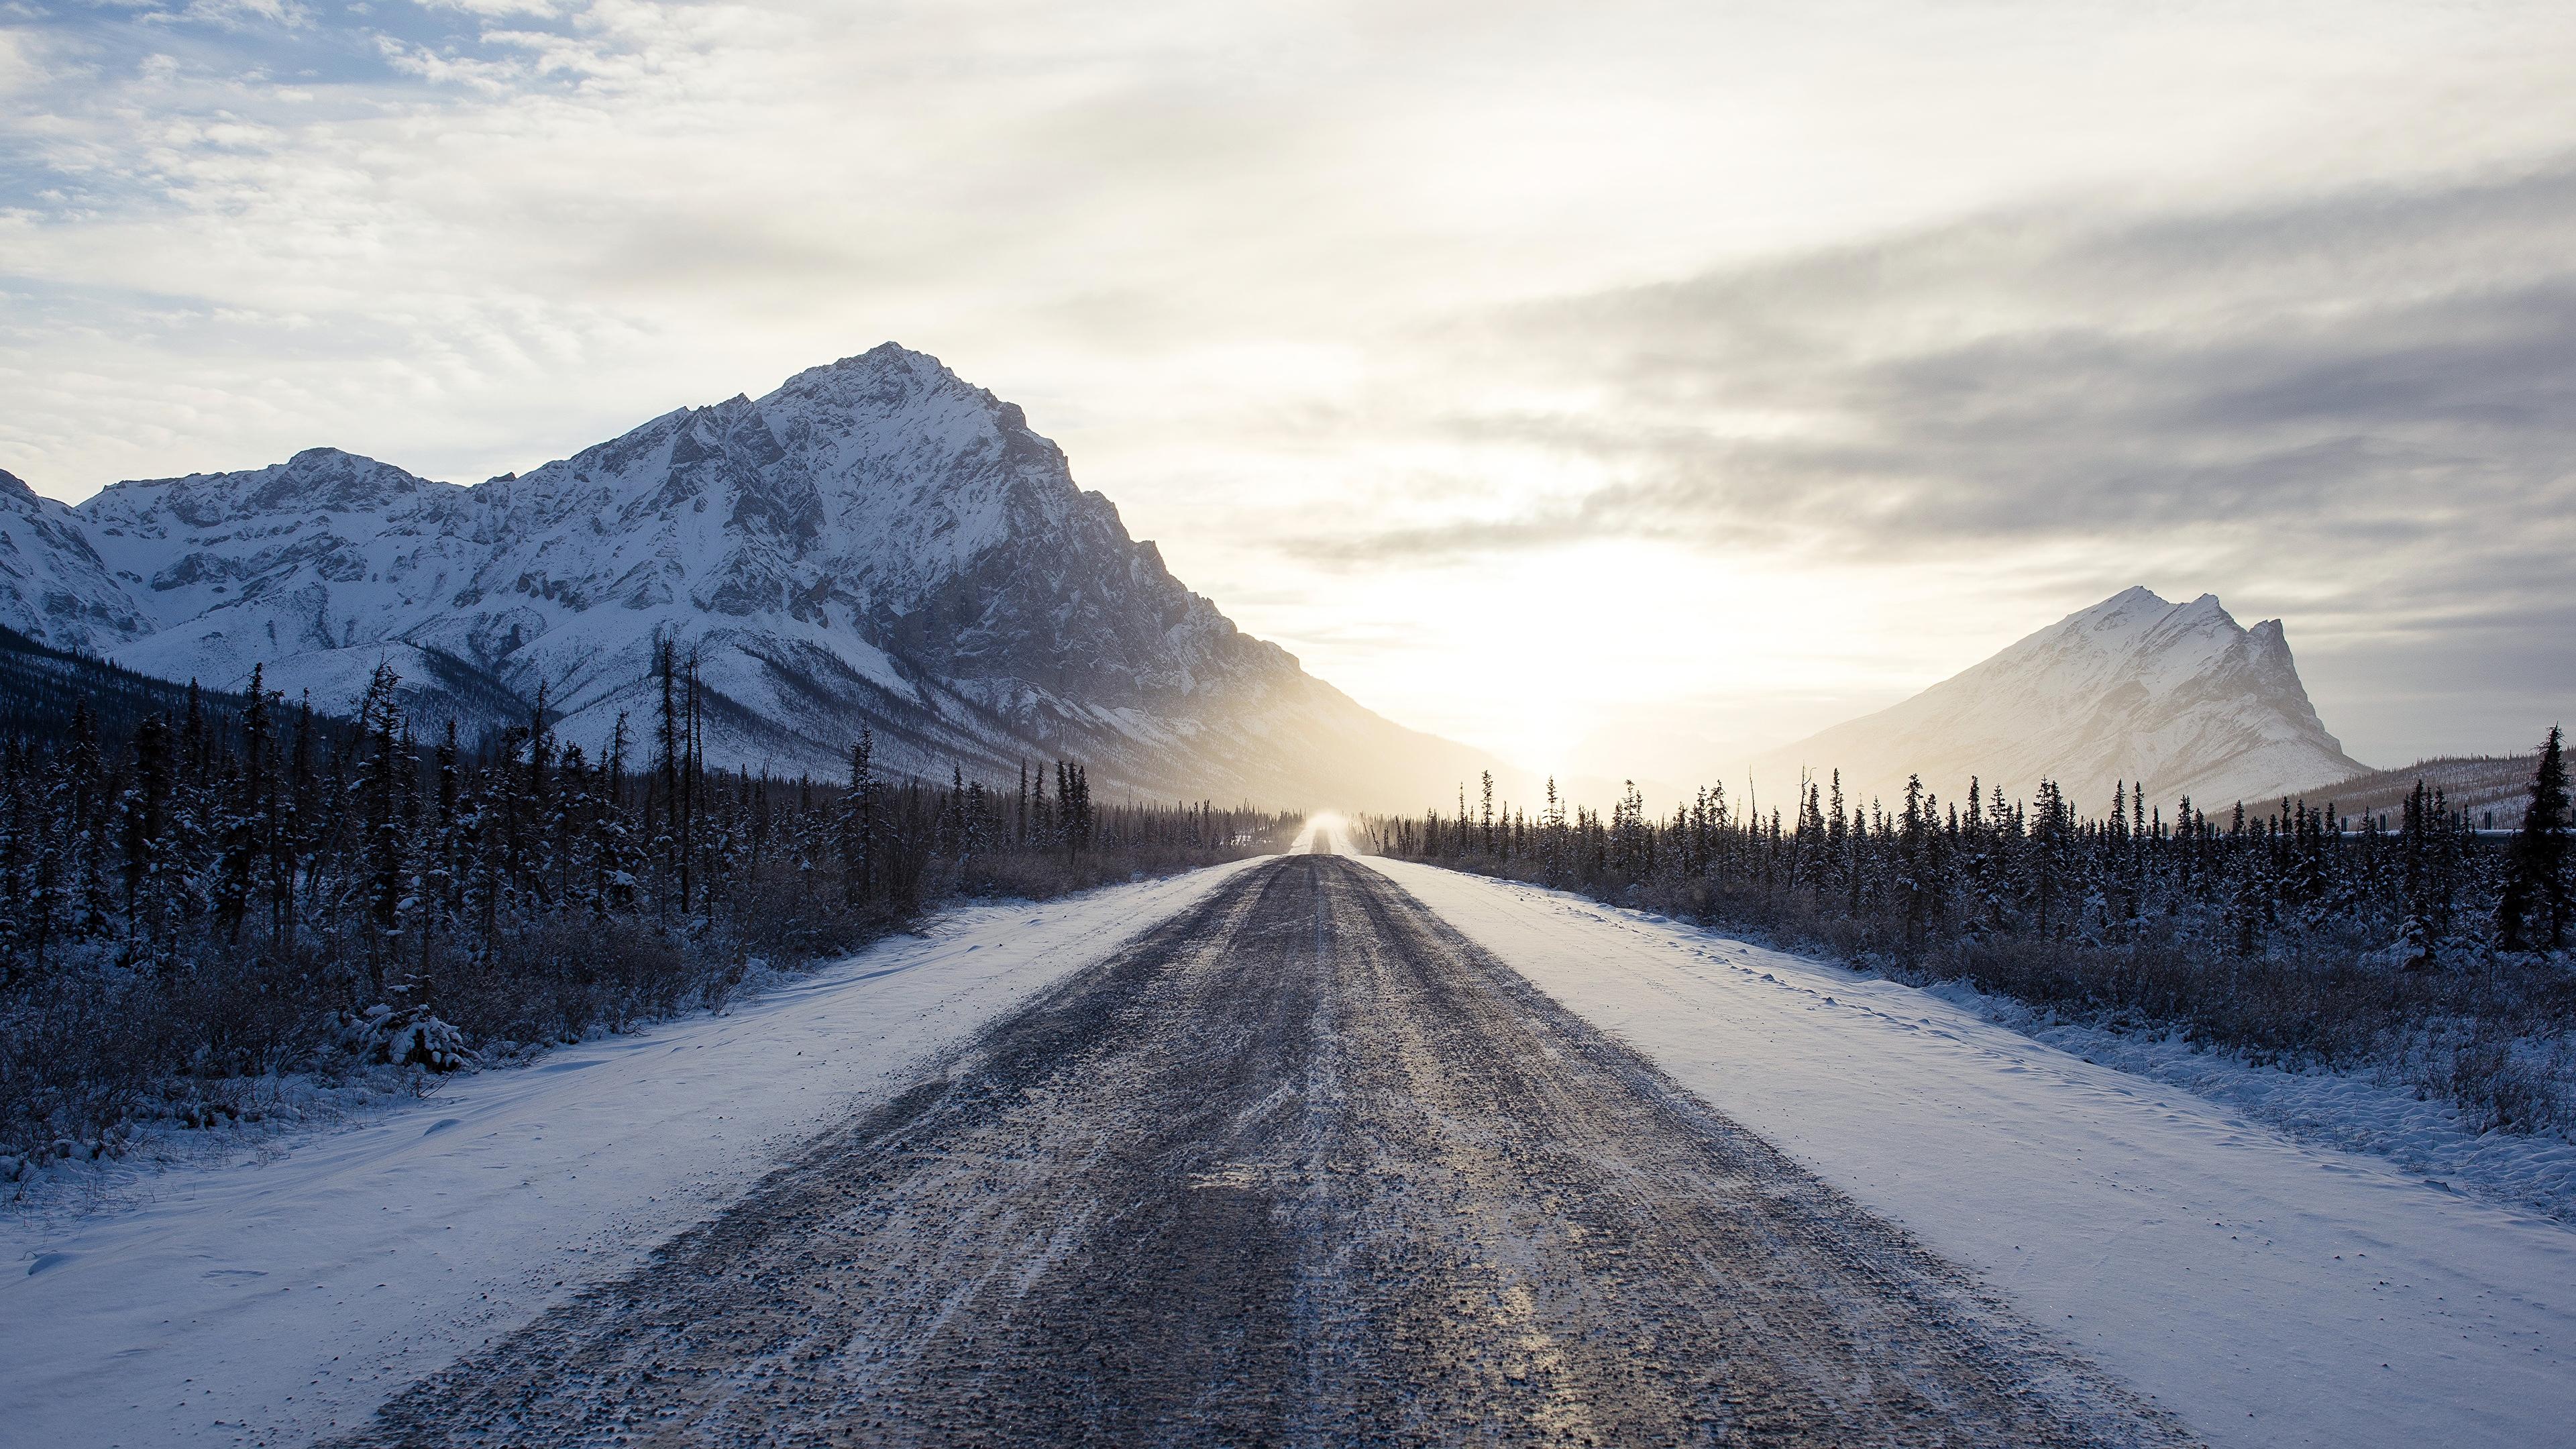 Road Snow Sunrise Winter 3840x2160